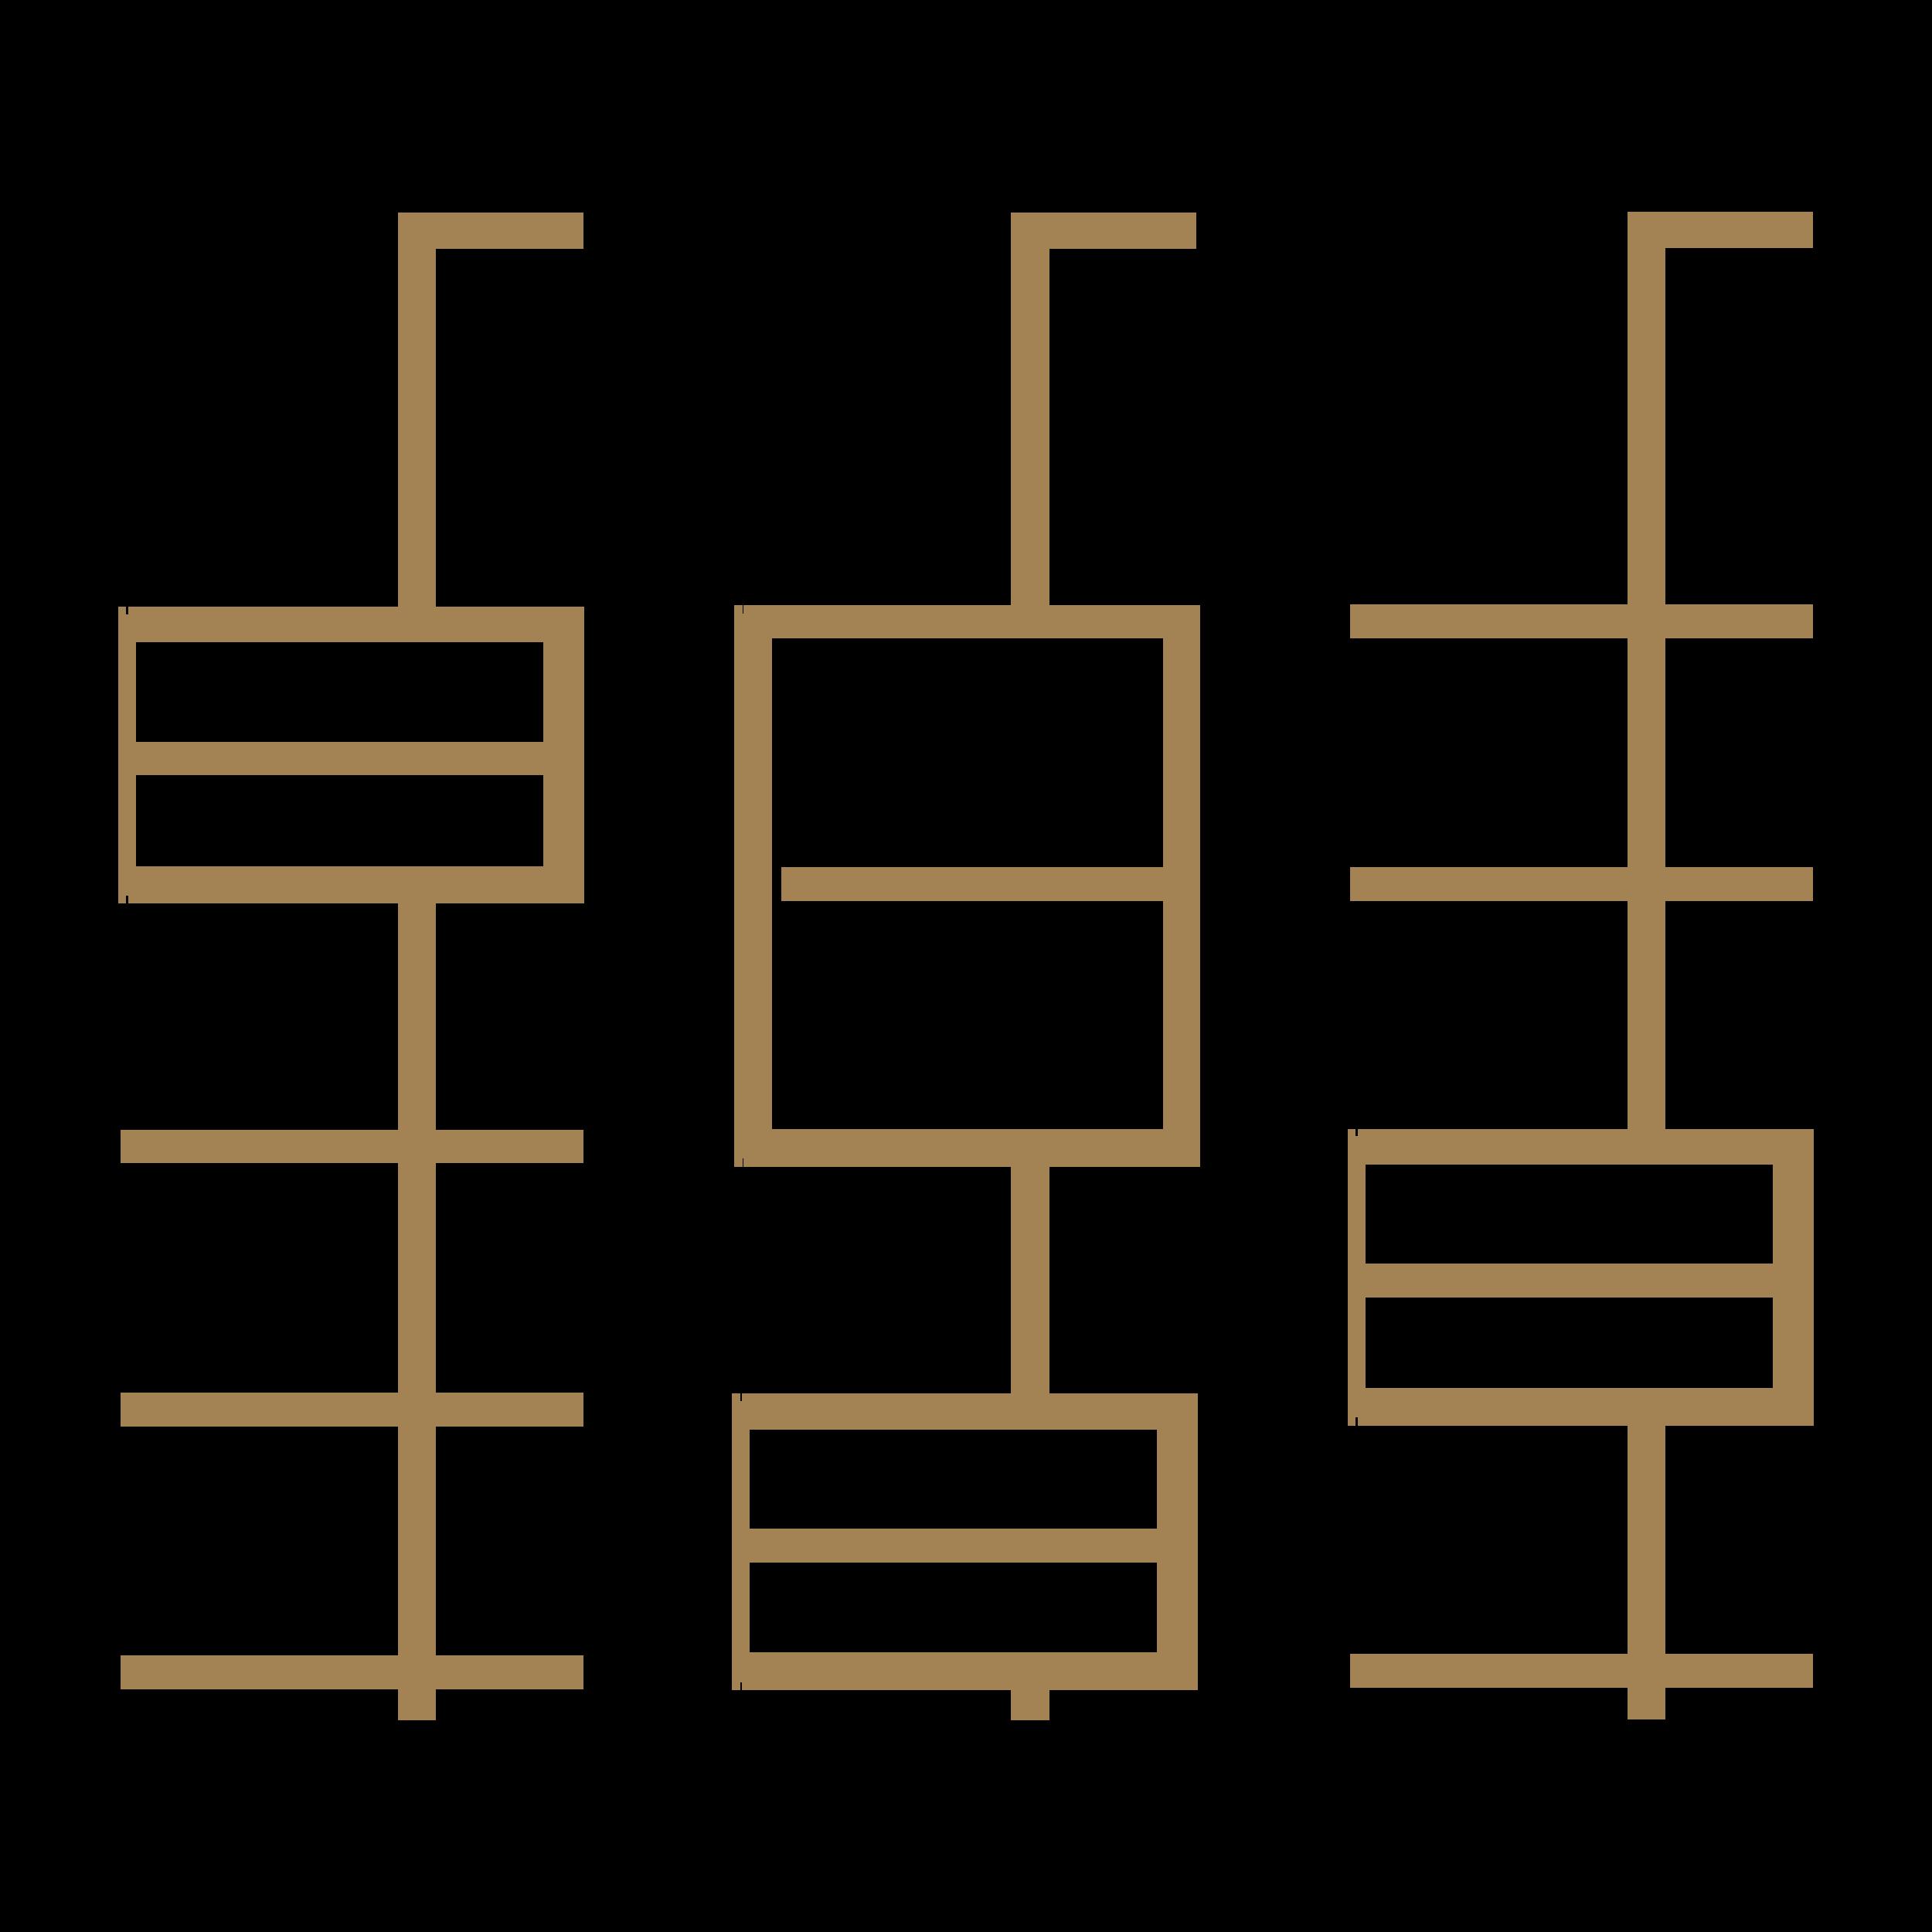 modularMesa de trabajo 1.png